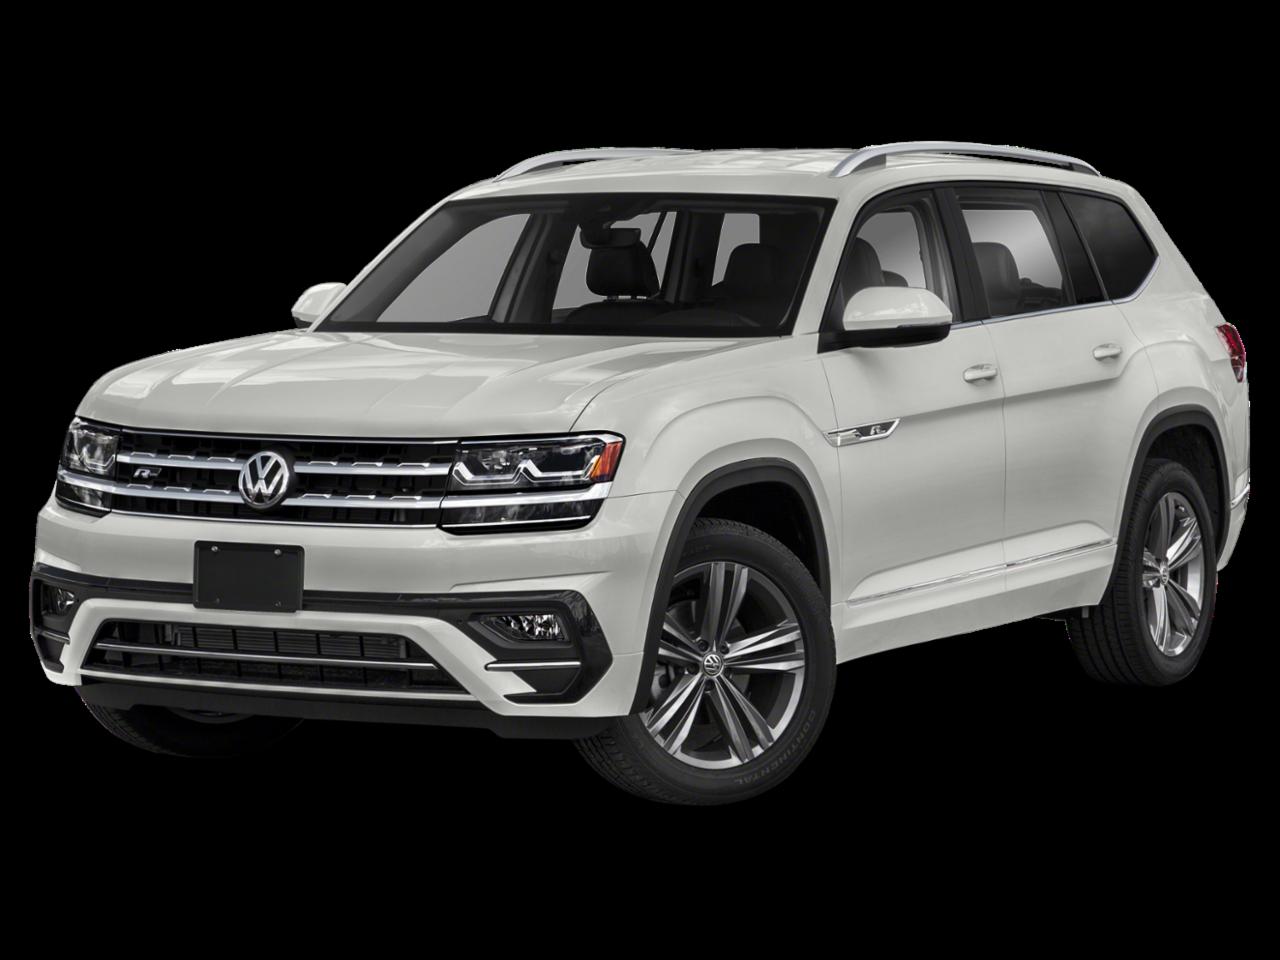 Volkswagen 2019 Atlas 3.6L V6 SEL R-Line